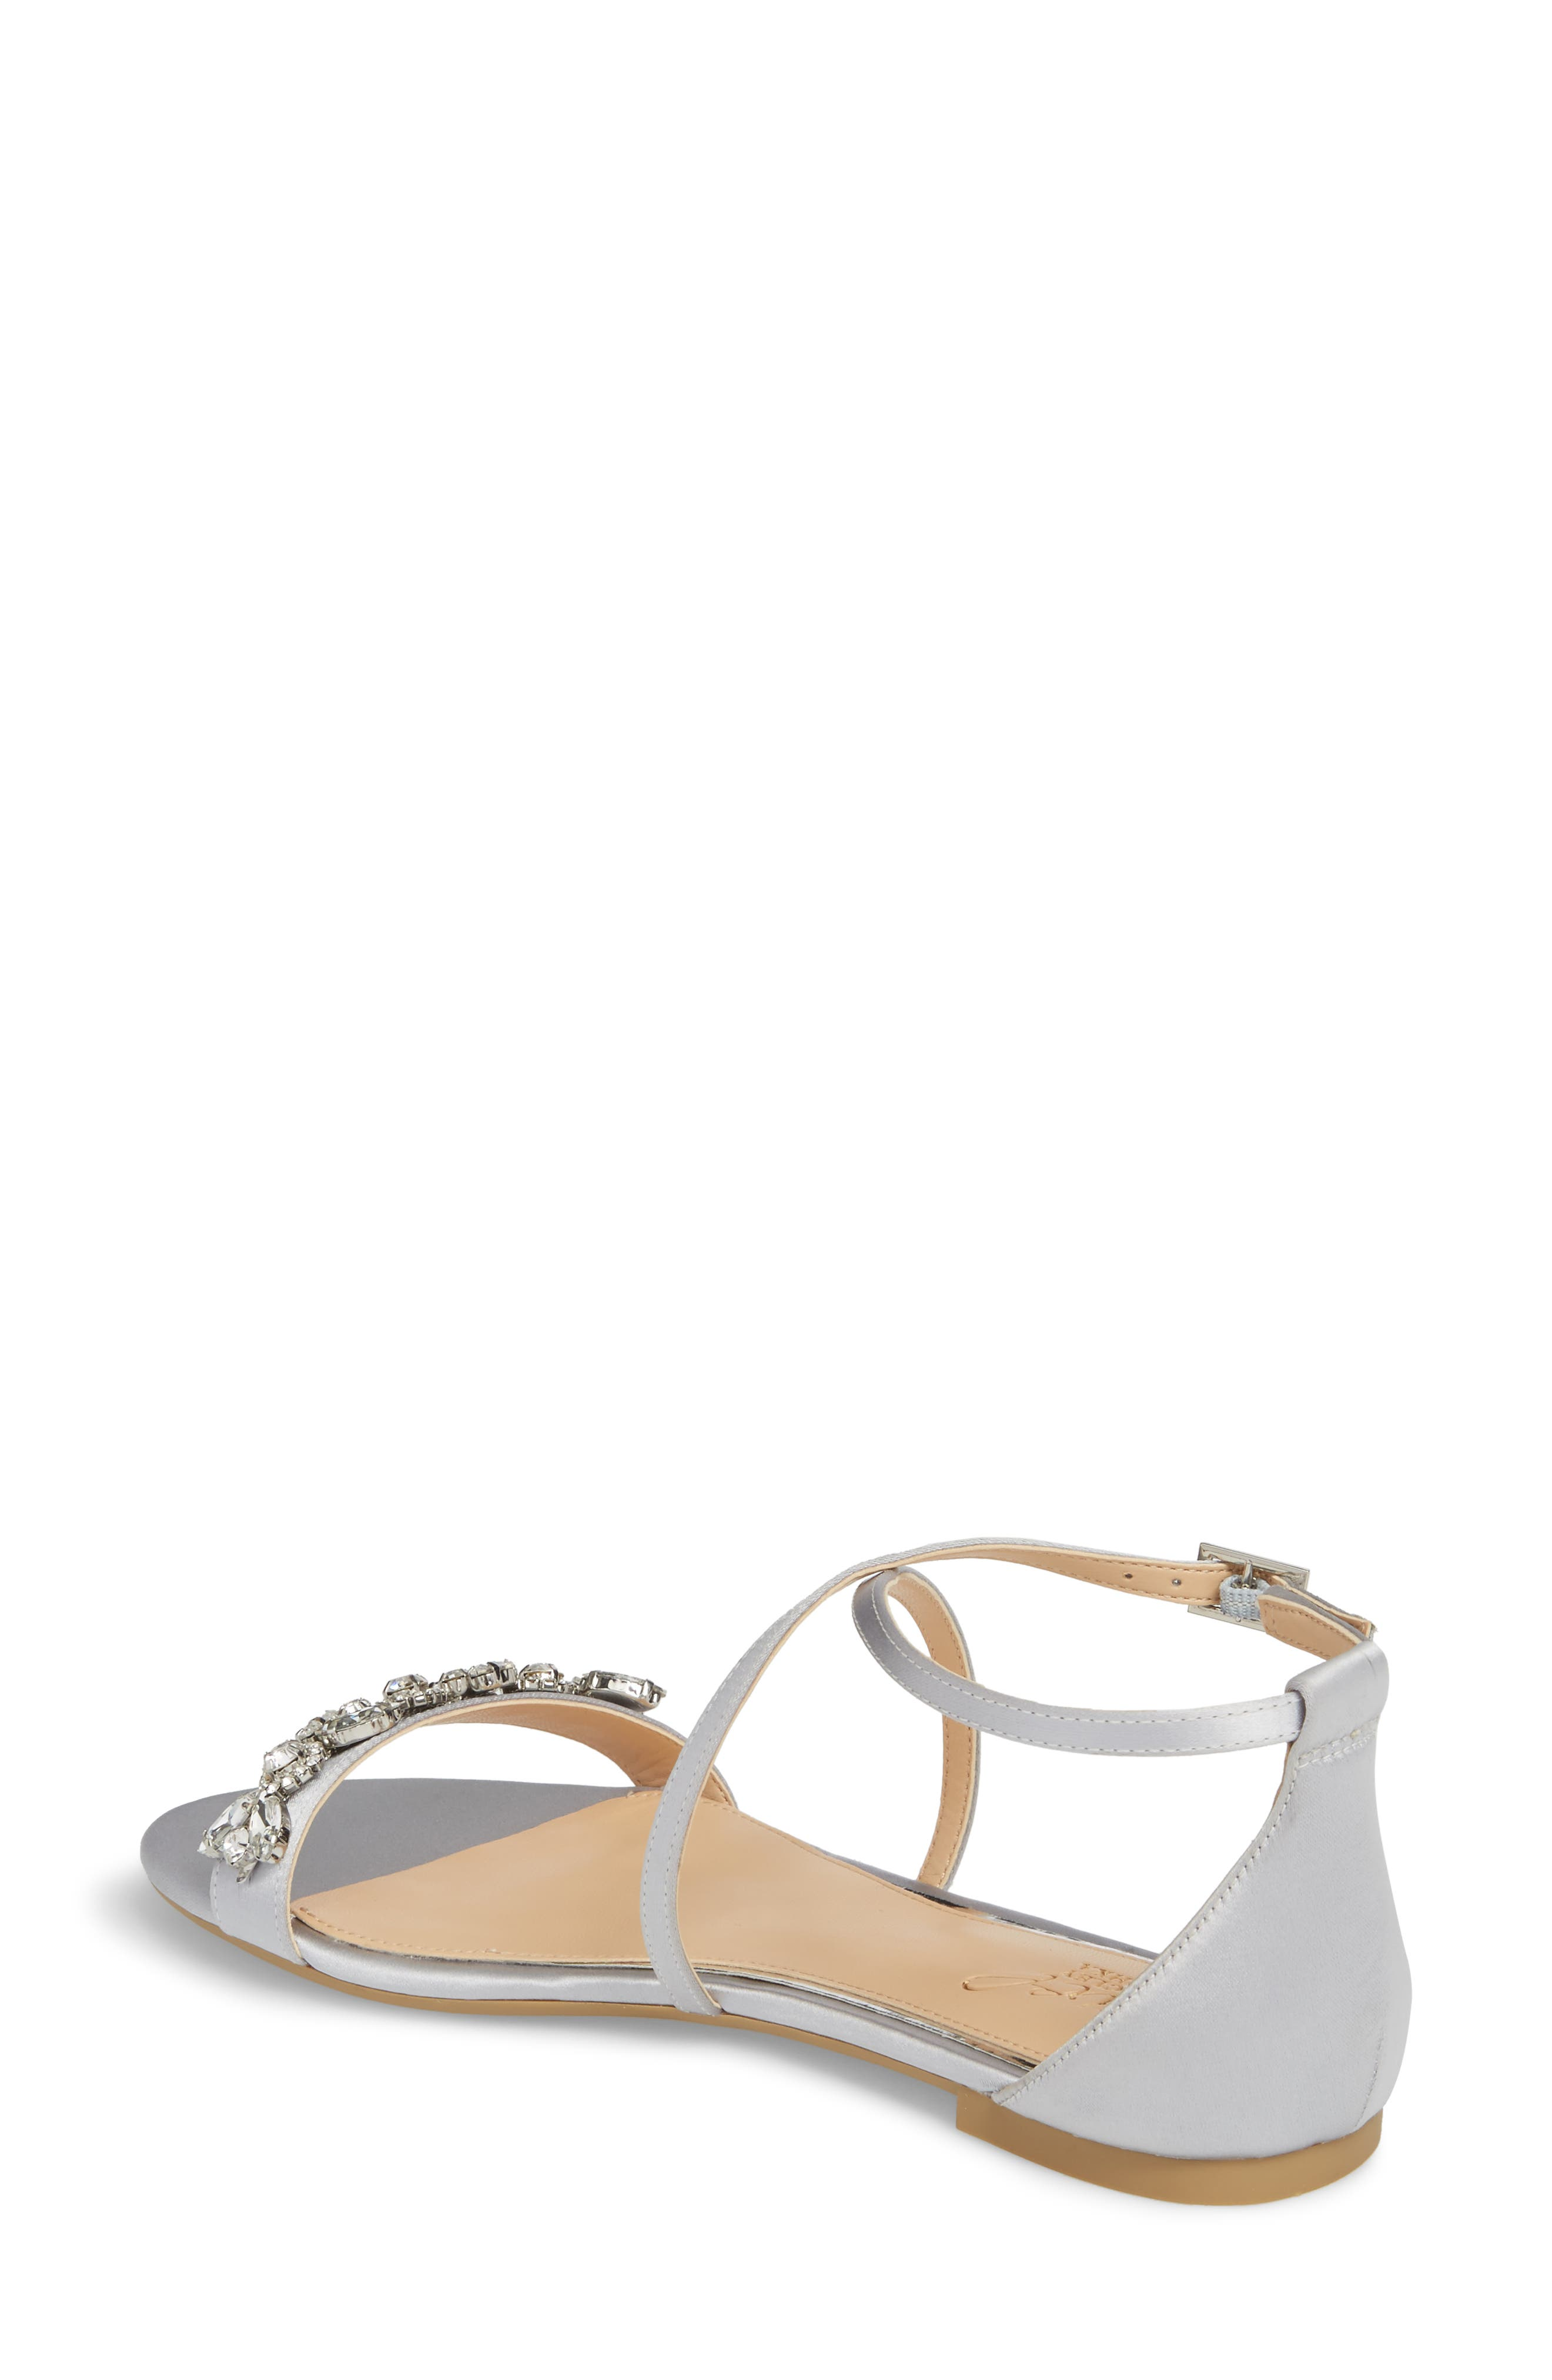 Tessy Embellished Sandal,                             Alternate thumbnail 2, color,                             Silver Satin